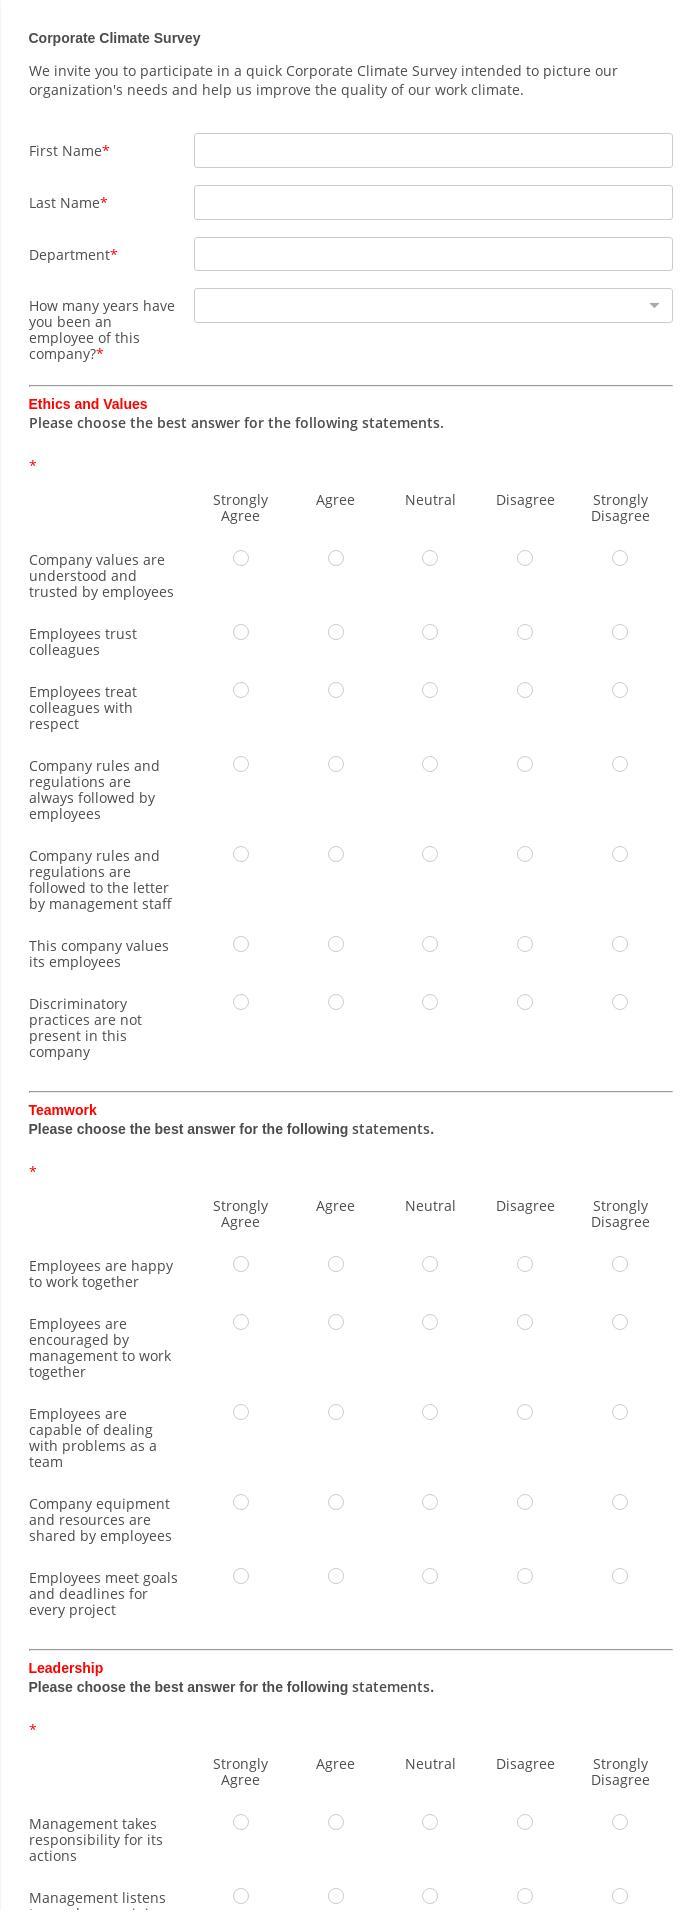 Corporate Climate Survey